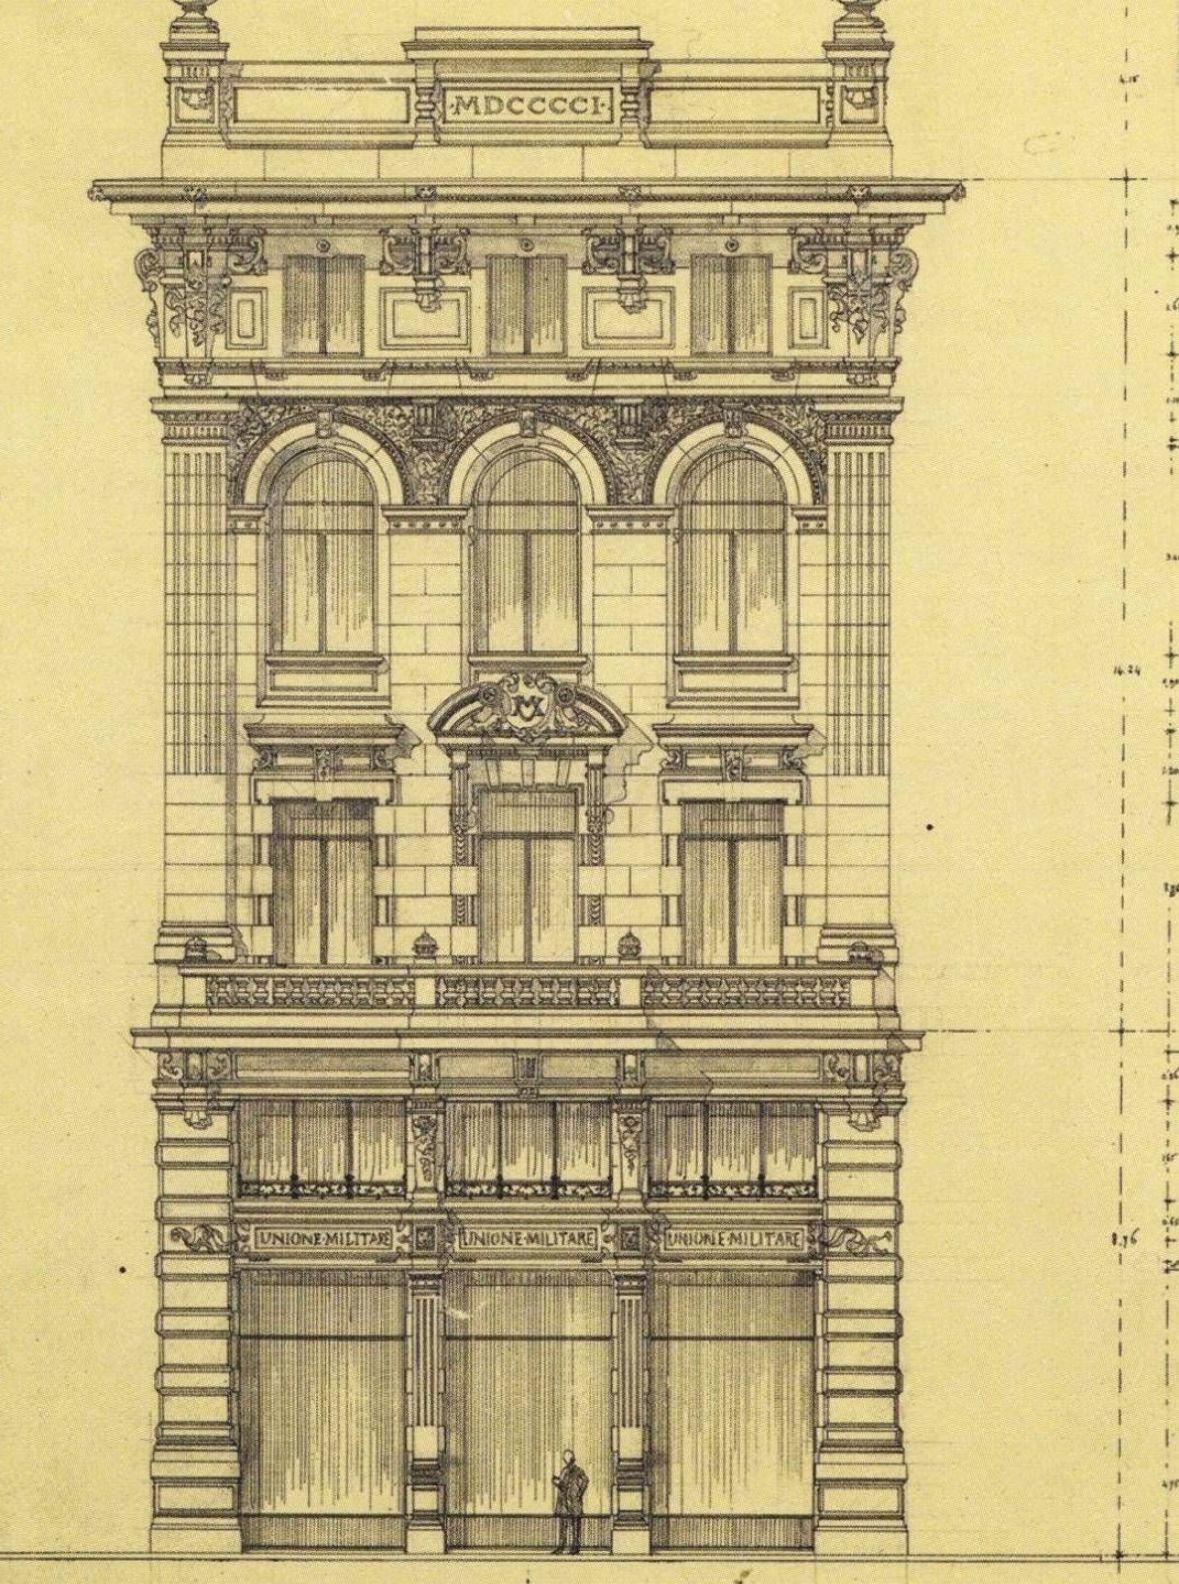 Pin By Monica Abril On Dibujo Architecture Drawing Classic Architecture Neoclassical Architecture